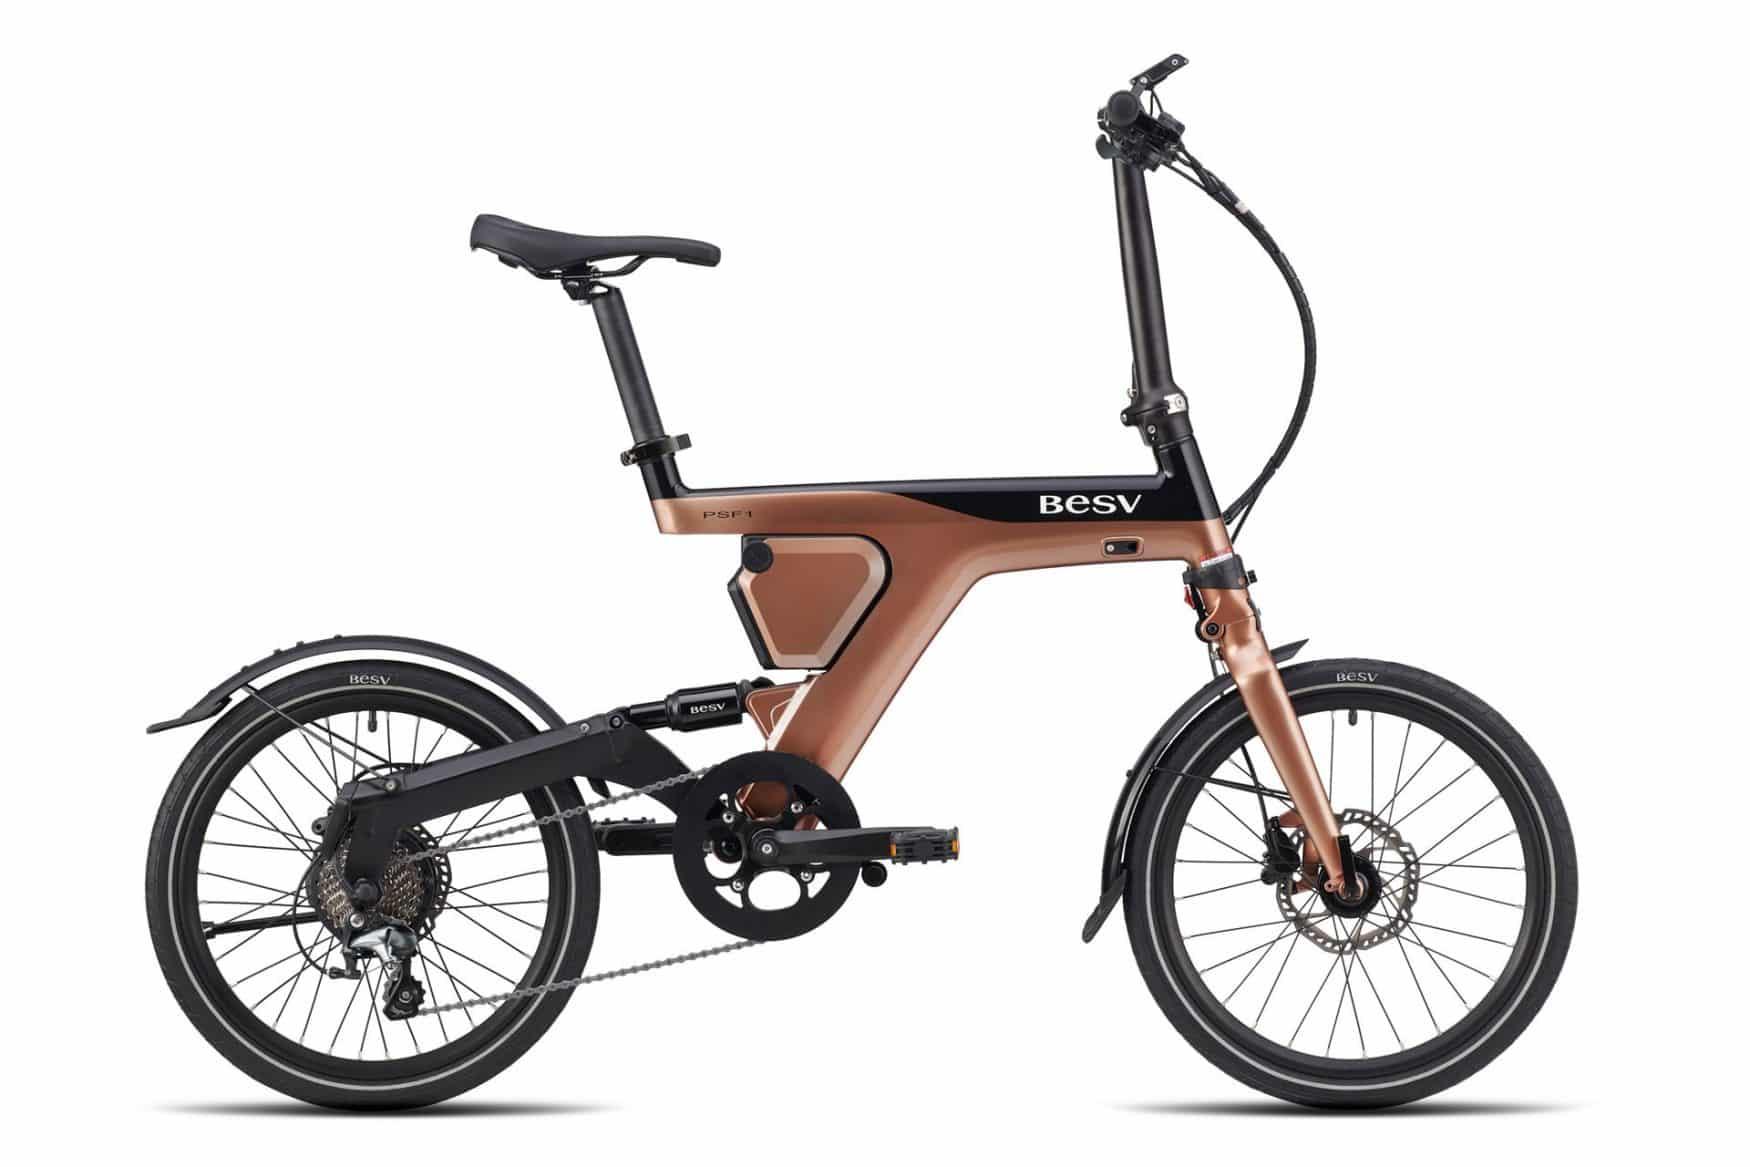 Opvouwbare e-bike PSF11 BESV